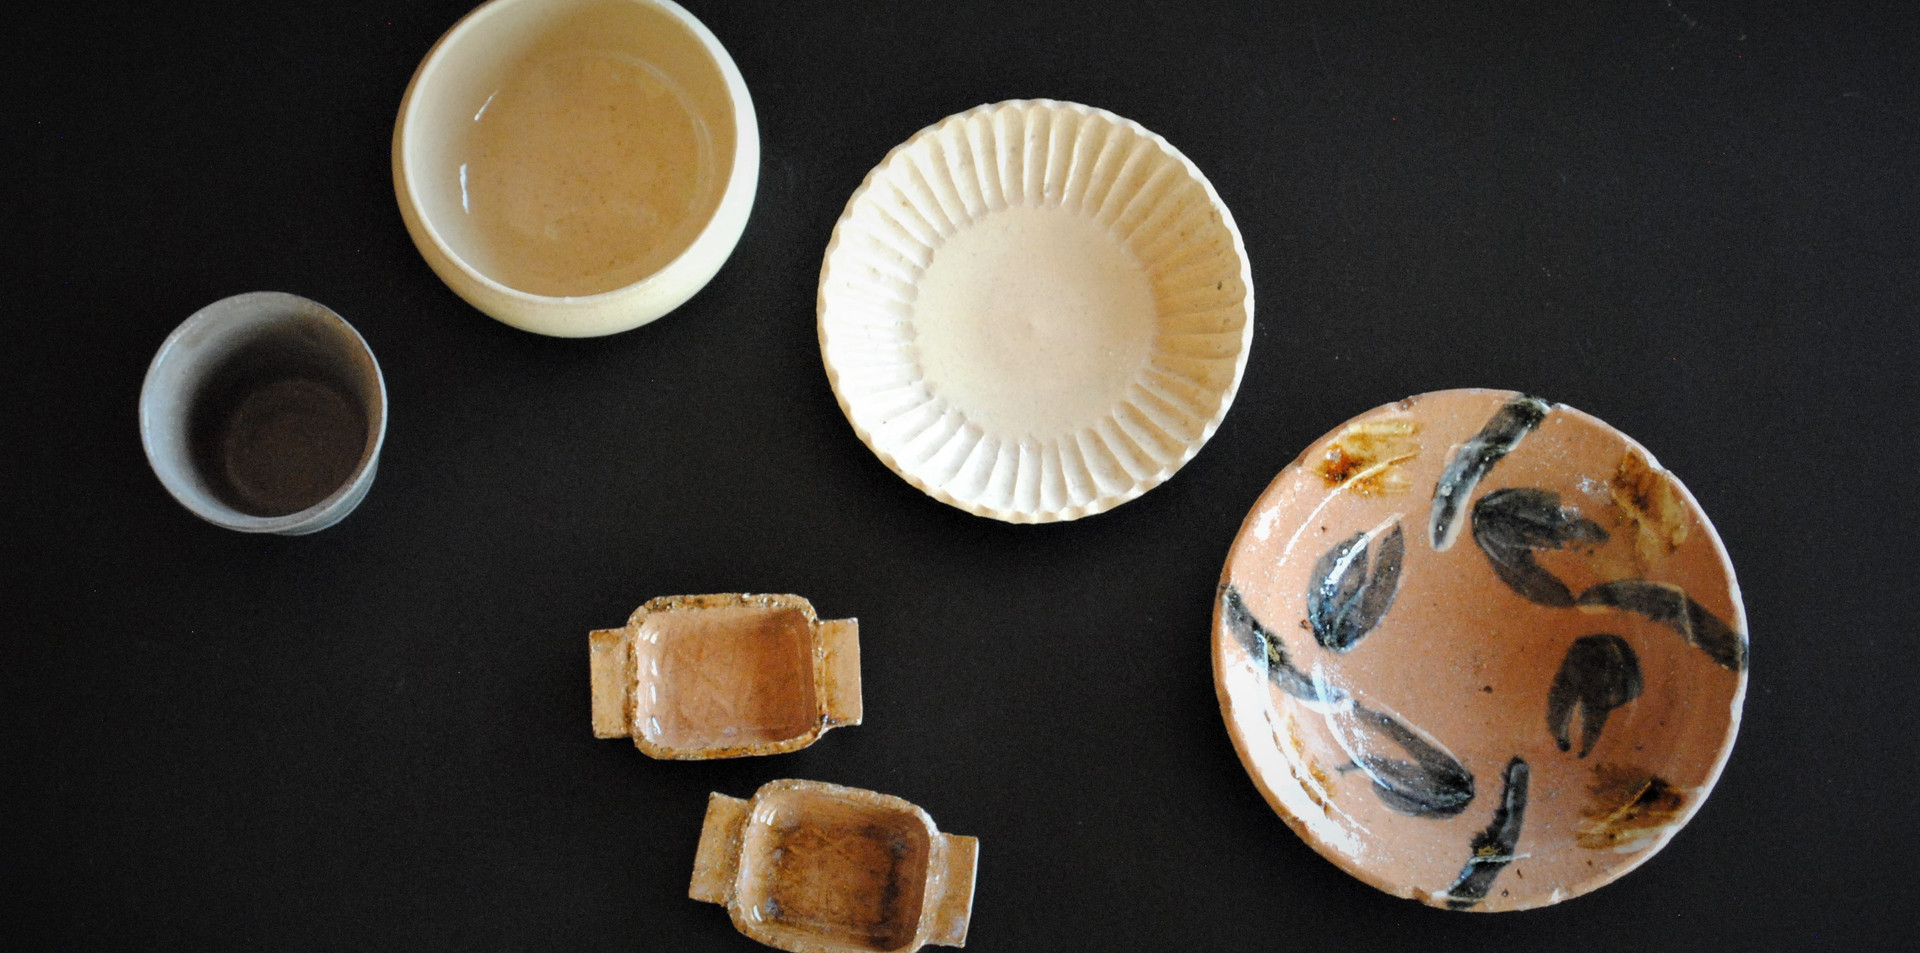 食と器ming 水谷直樹作品